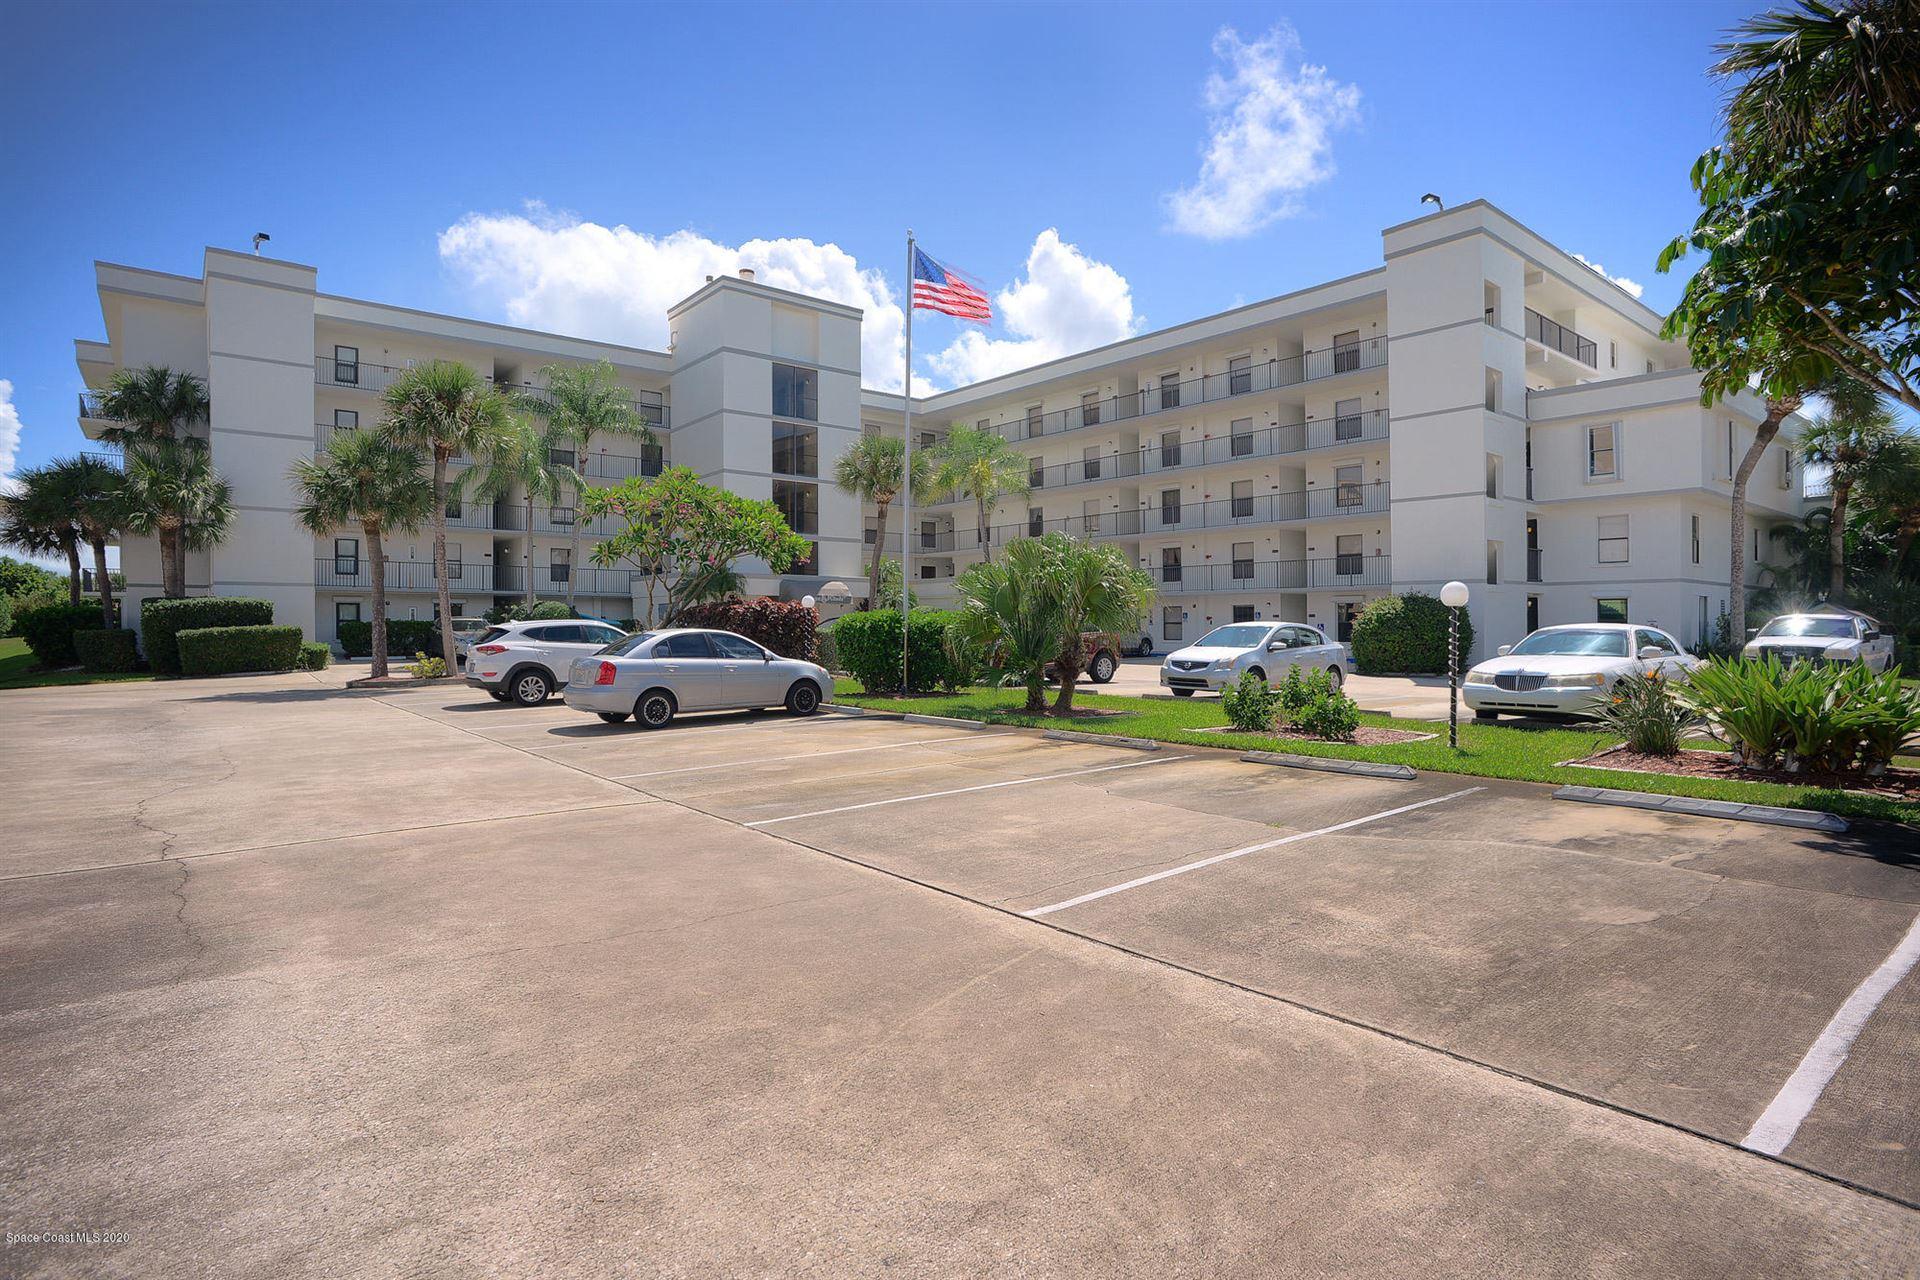 7400 Ridgewood Avenue #314, Cape Canaveral, FL 32920 - #: 885194